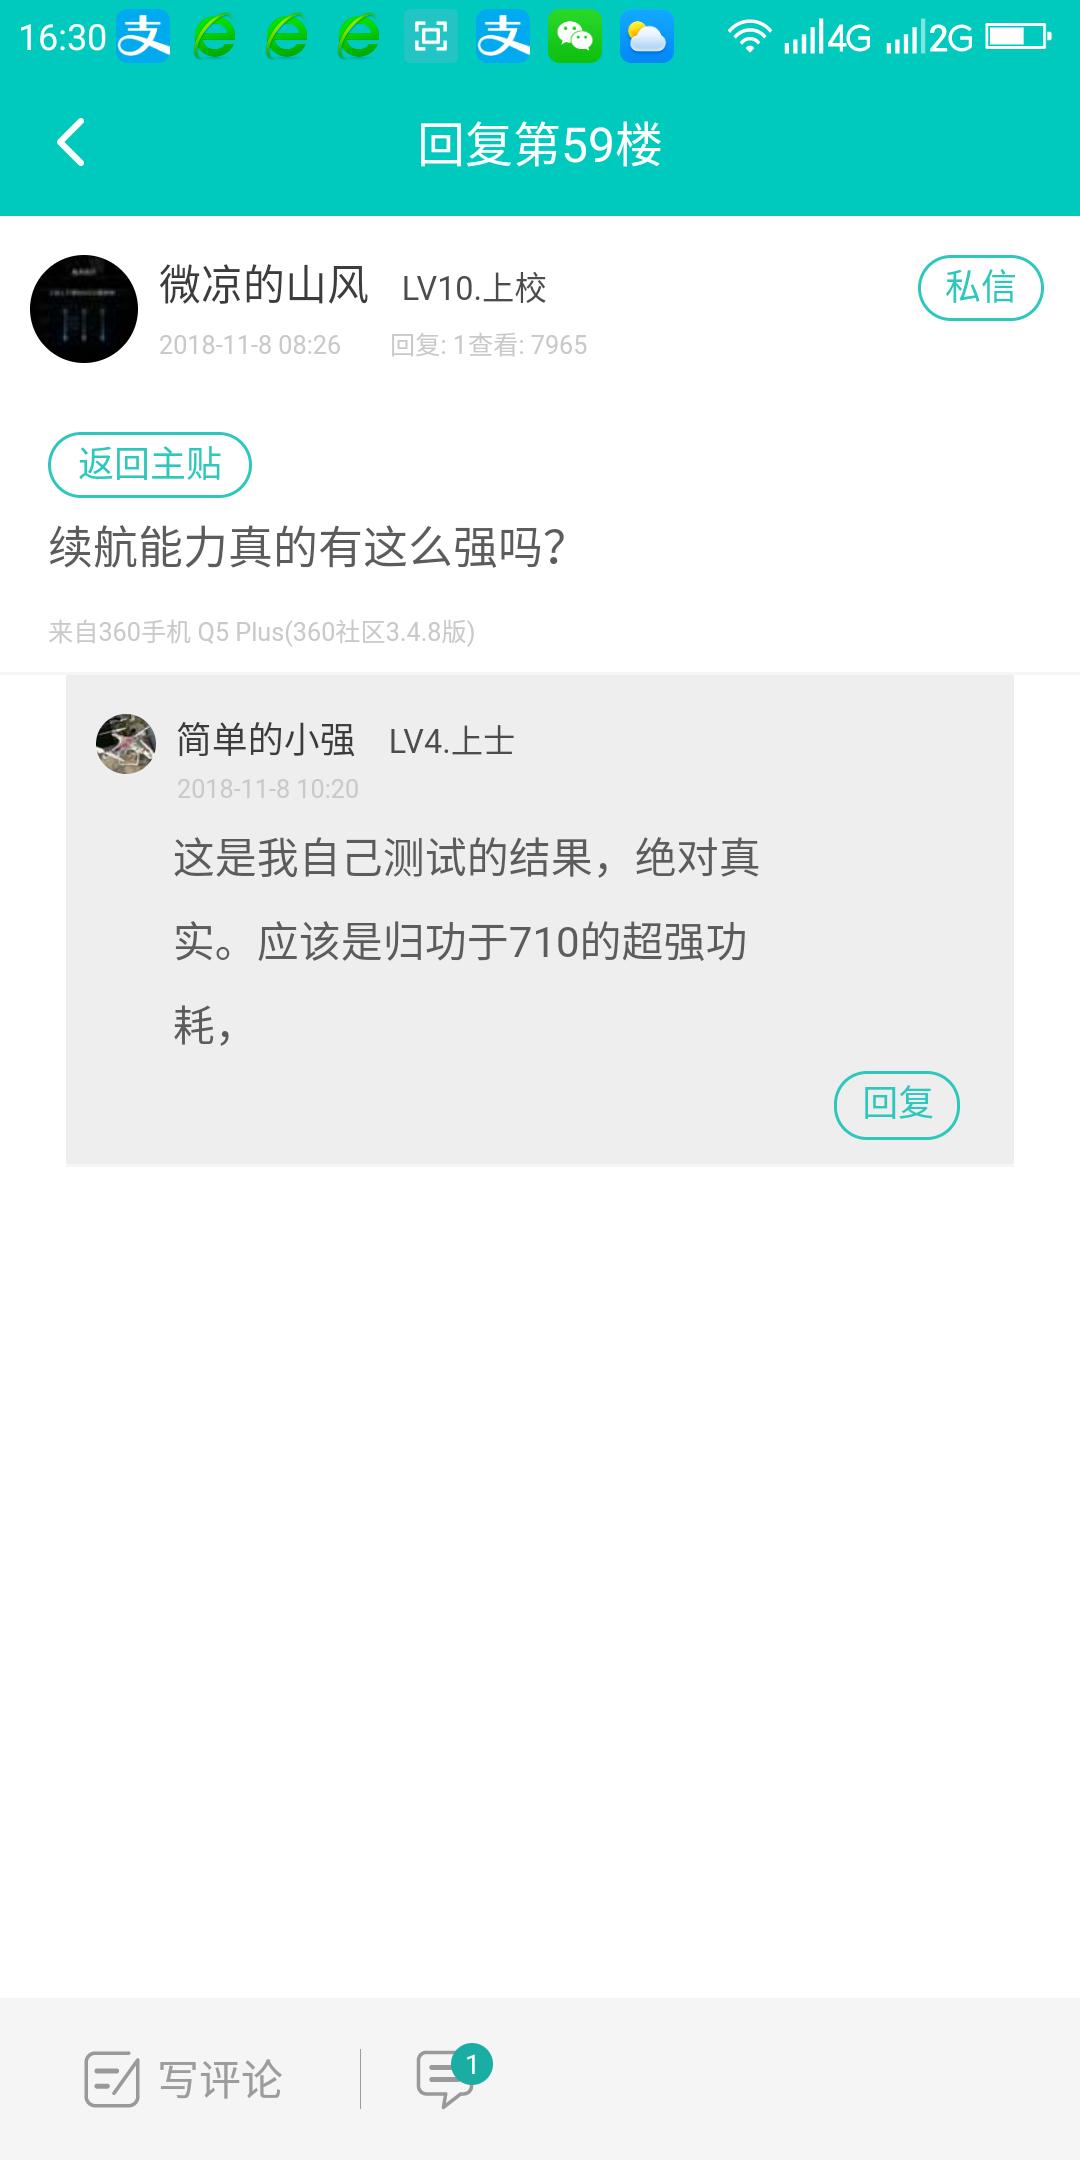 Screenshot_2018-11-14-16-30-27.png